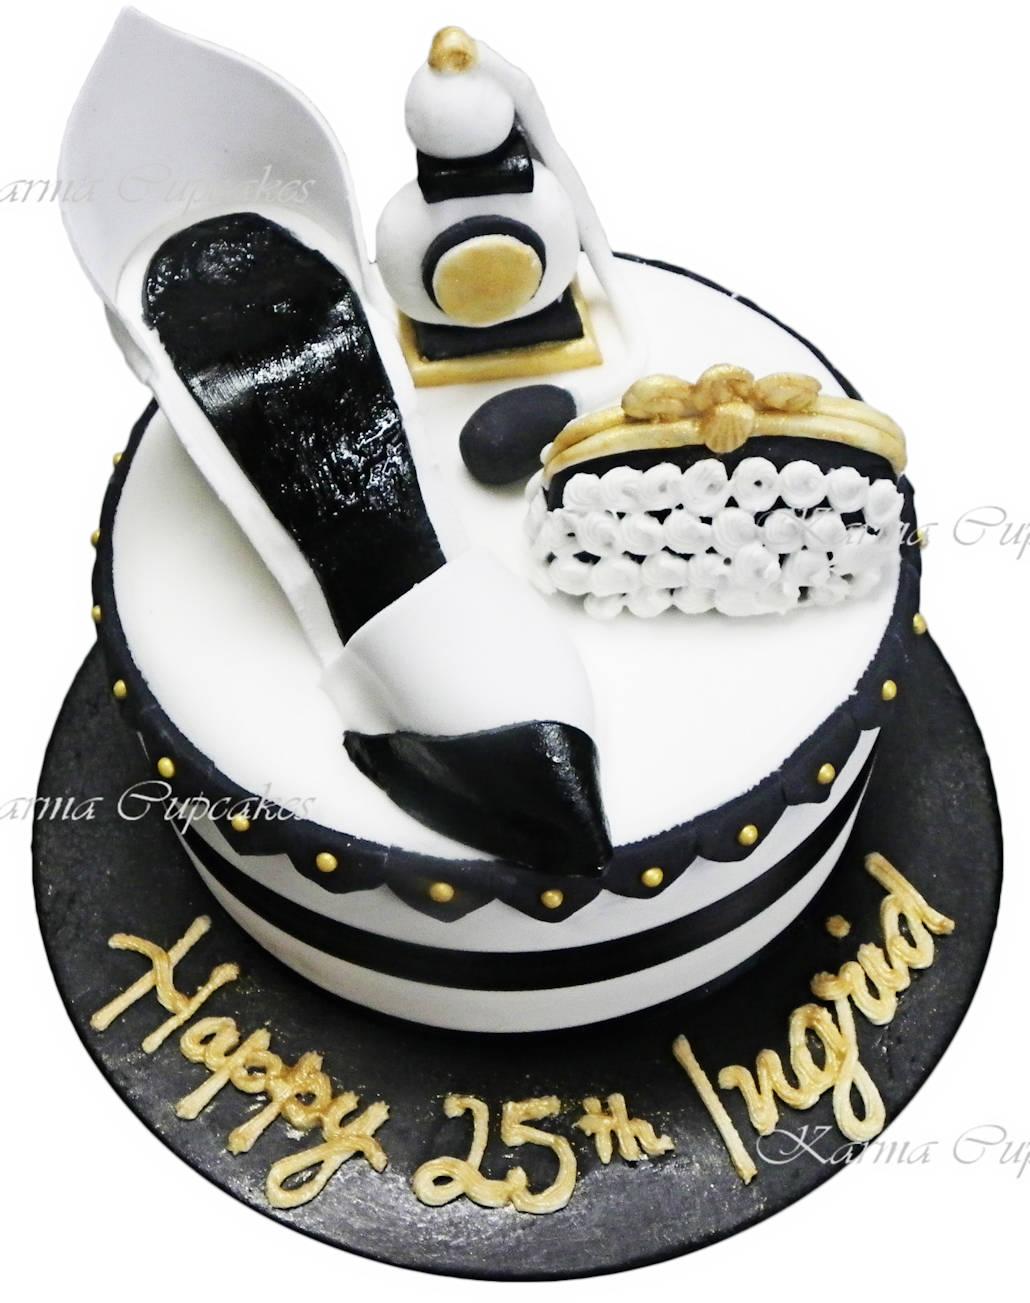 Shoe and purse birthday cake 3D sugar pieces copy